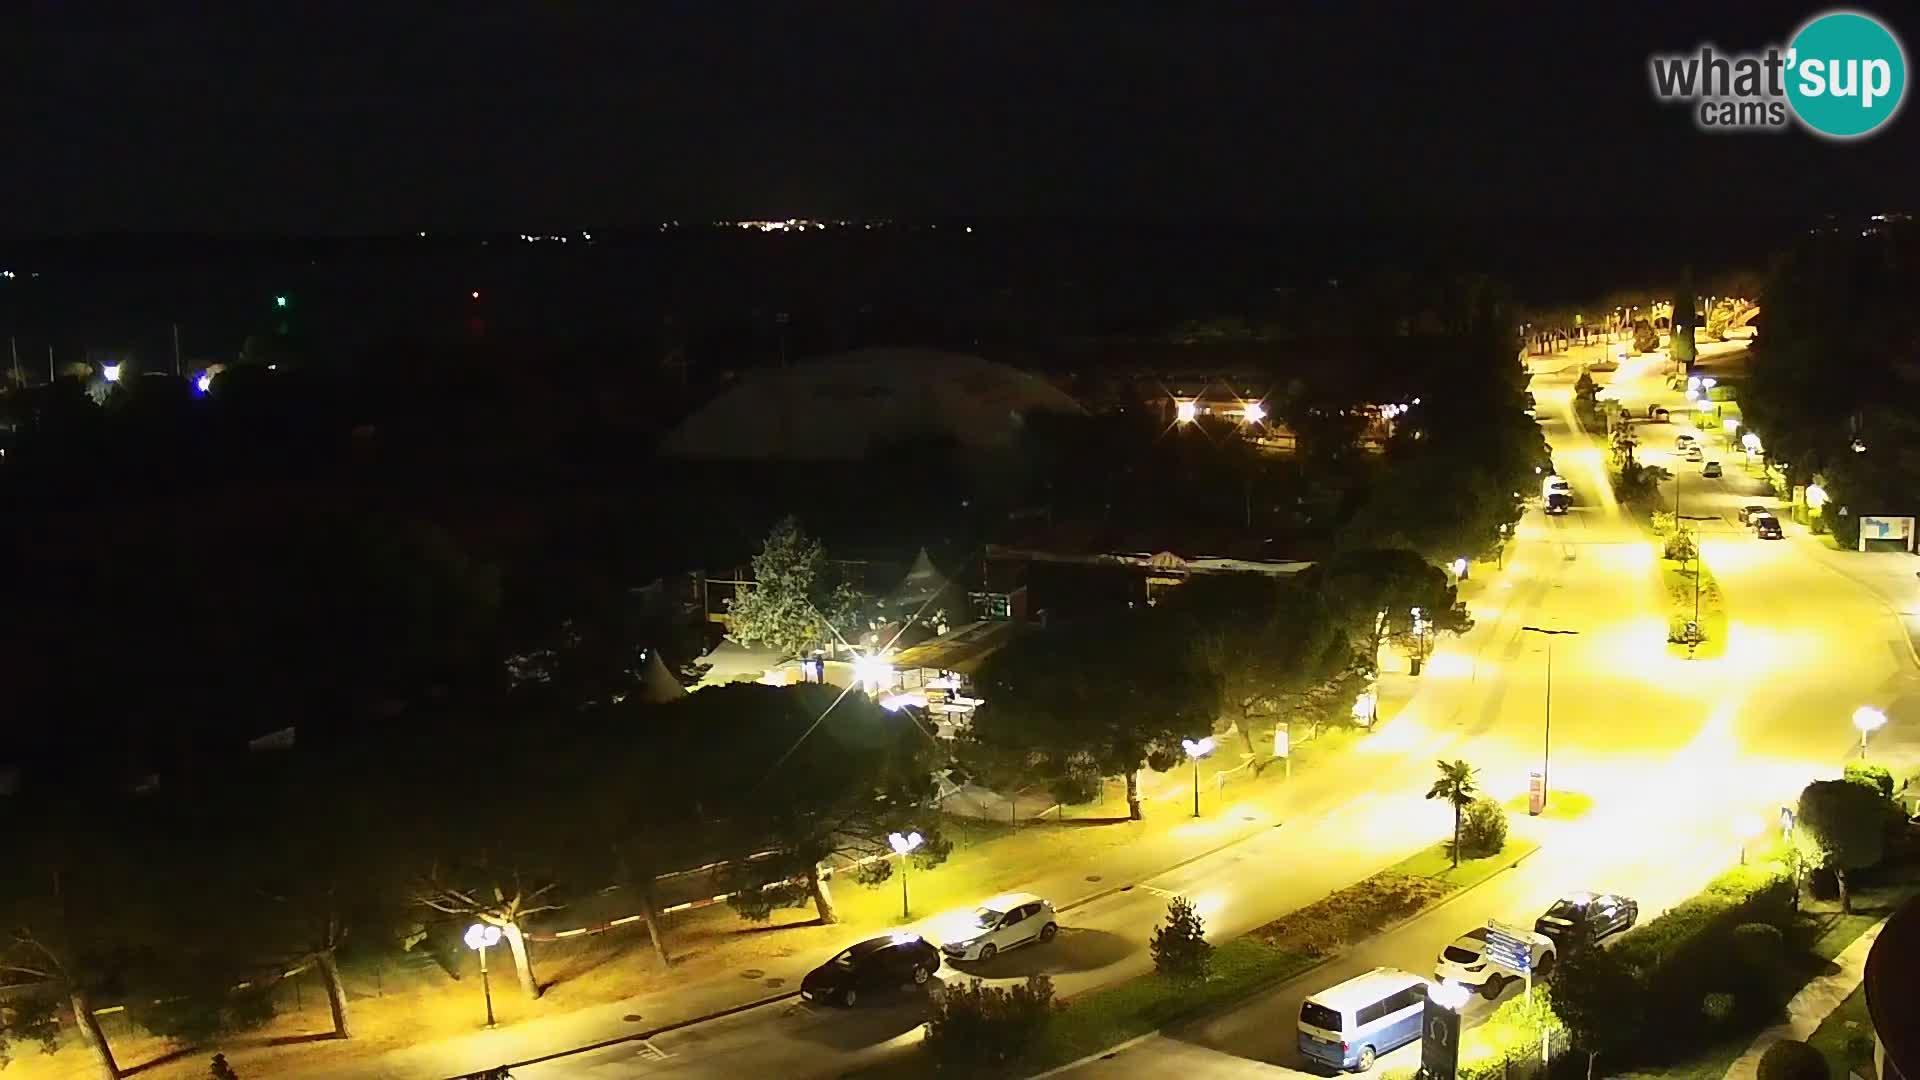 Portorož web kamera – pogled na marinu i teniške terene